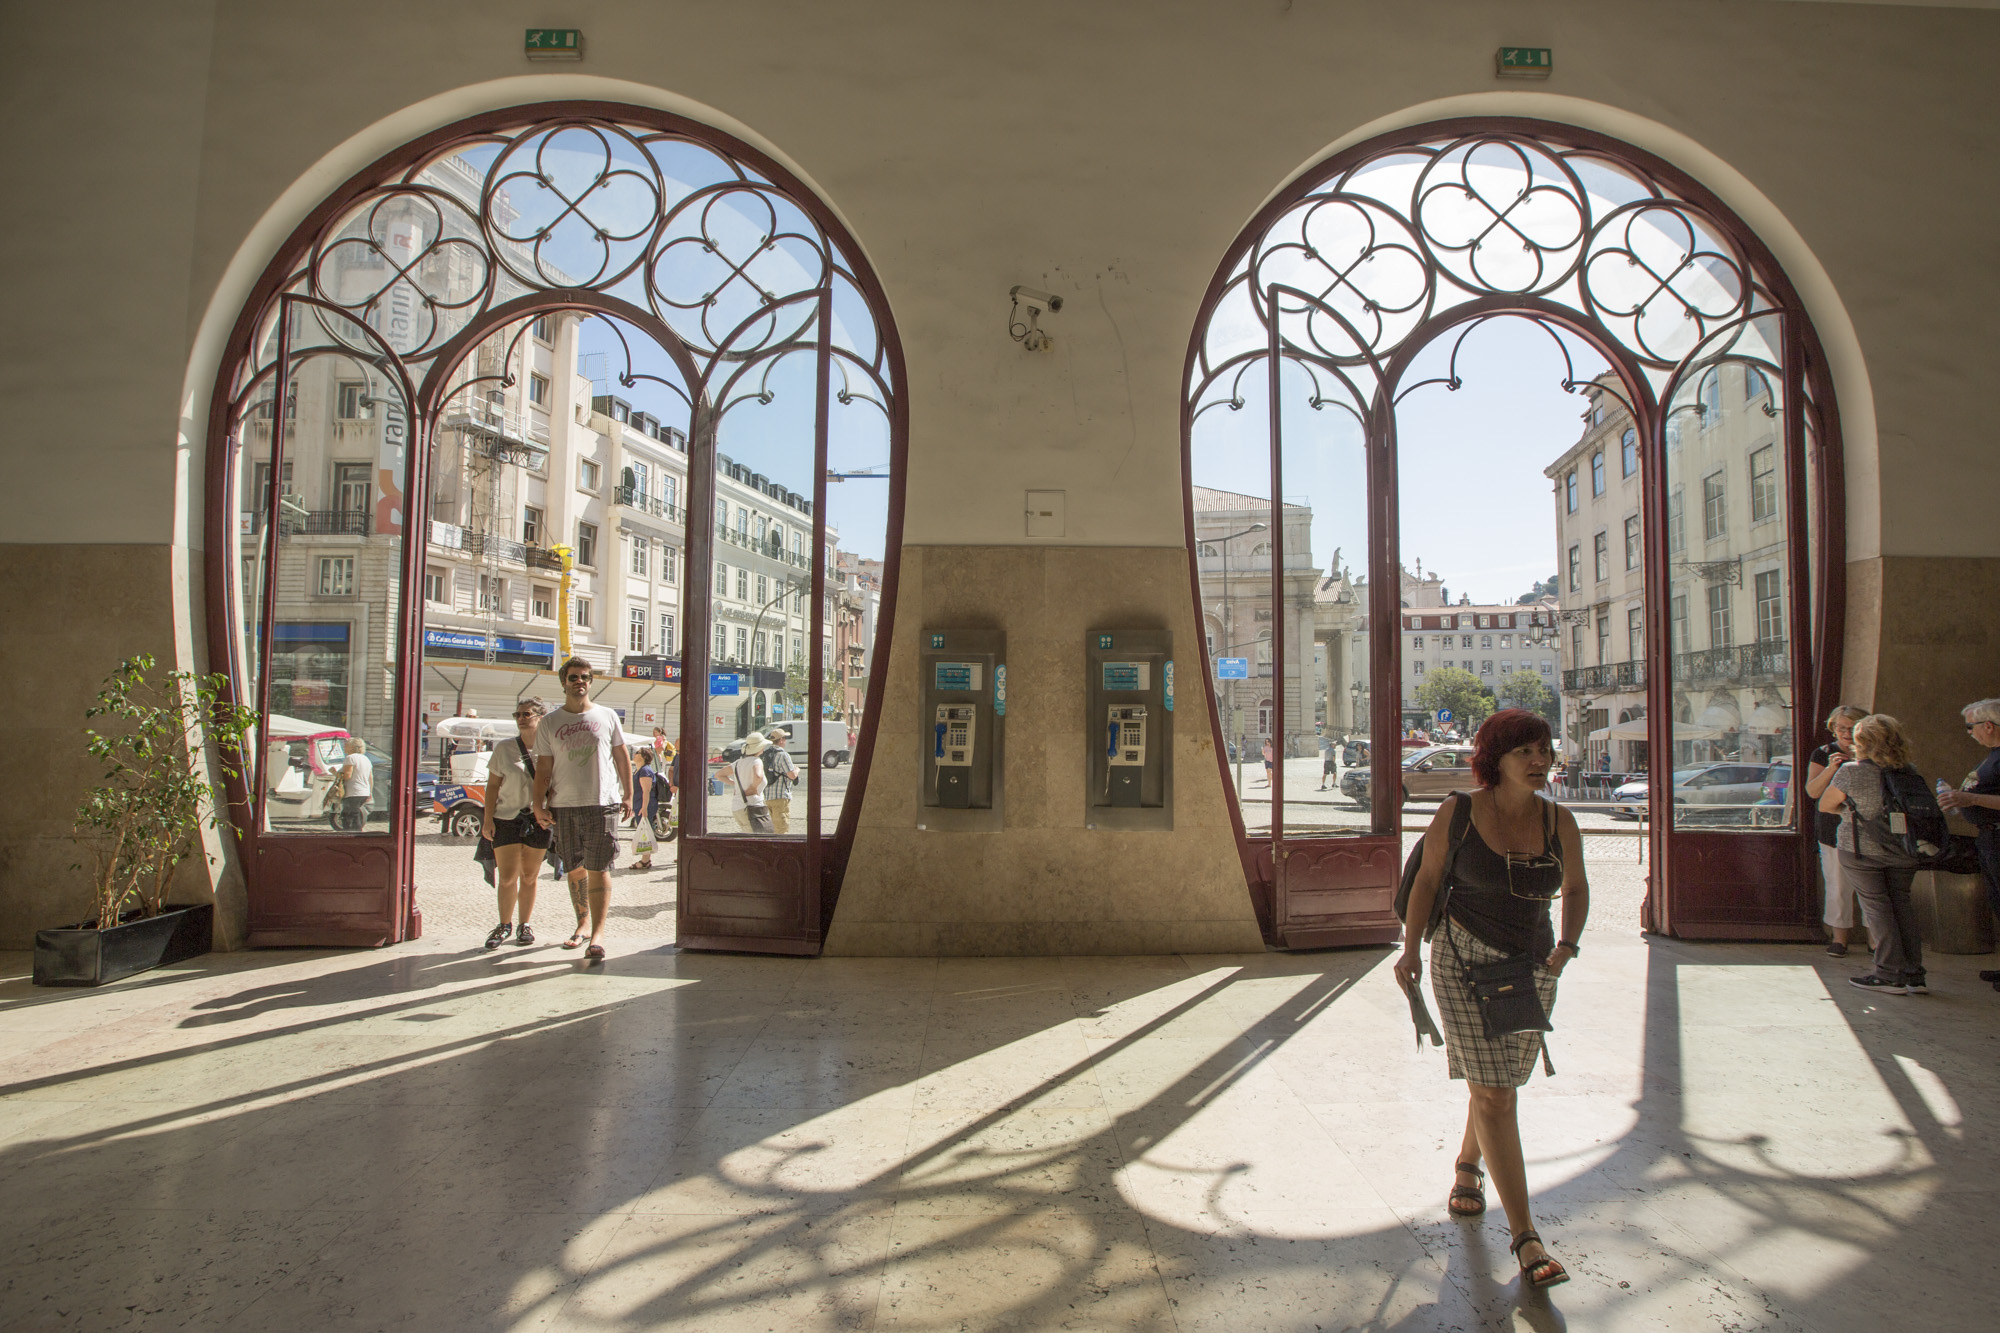 Portugal, Lissabon, Rossio Bahnhof, Hufeisenförmiger Eingang